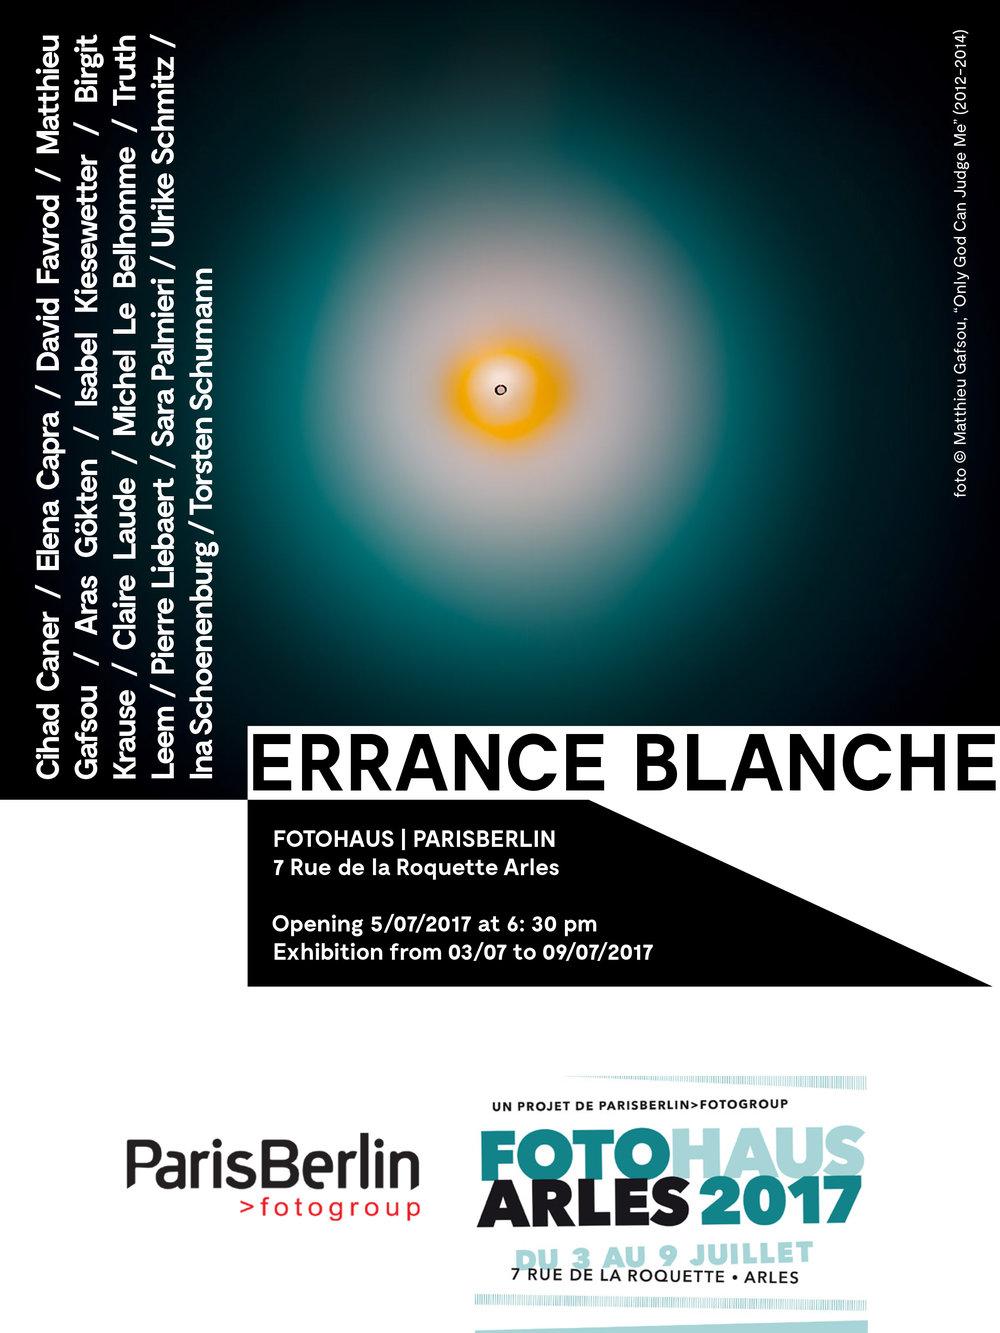 2017_Errance_Blanche_final.jpg